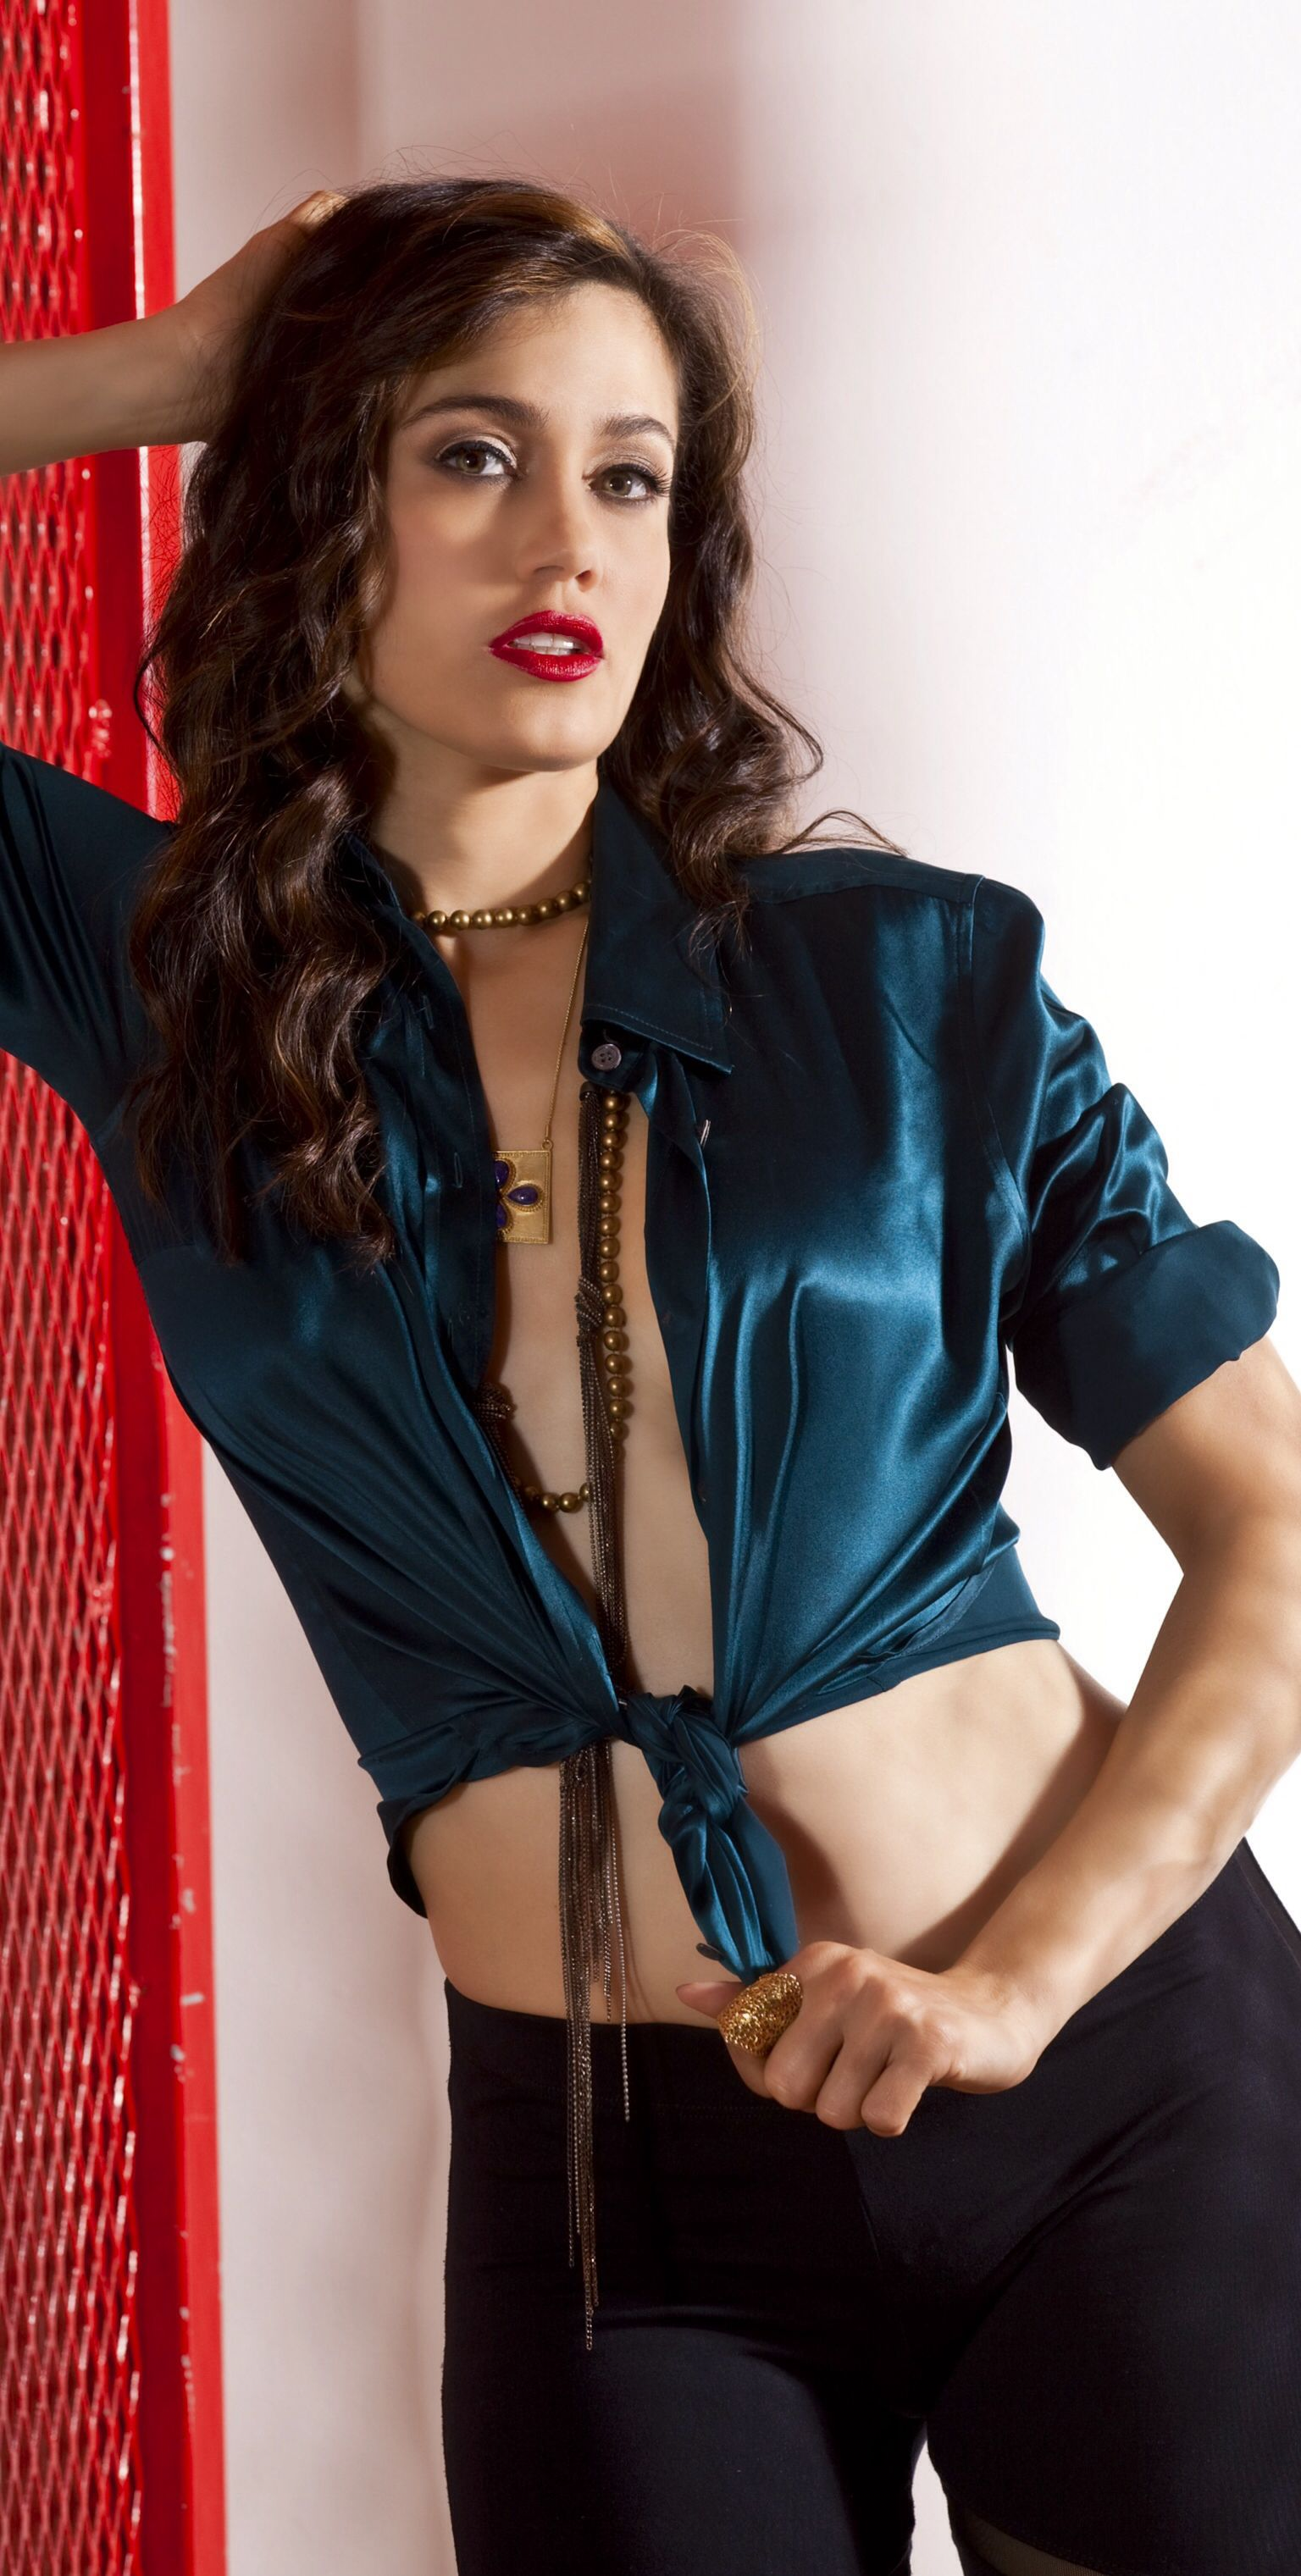 Alessandra Ambrosio Sexy. 2018-2019 celebrityes photos leaks! - 2019 year